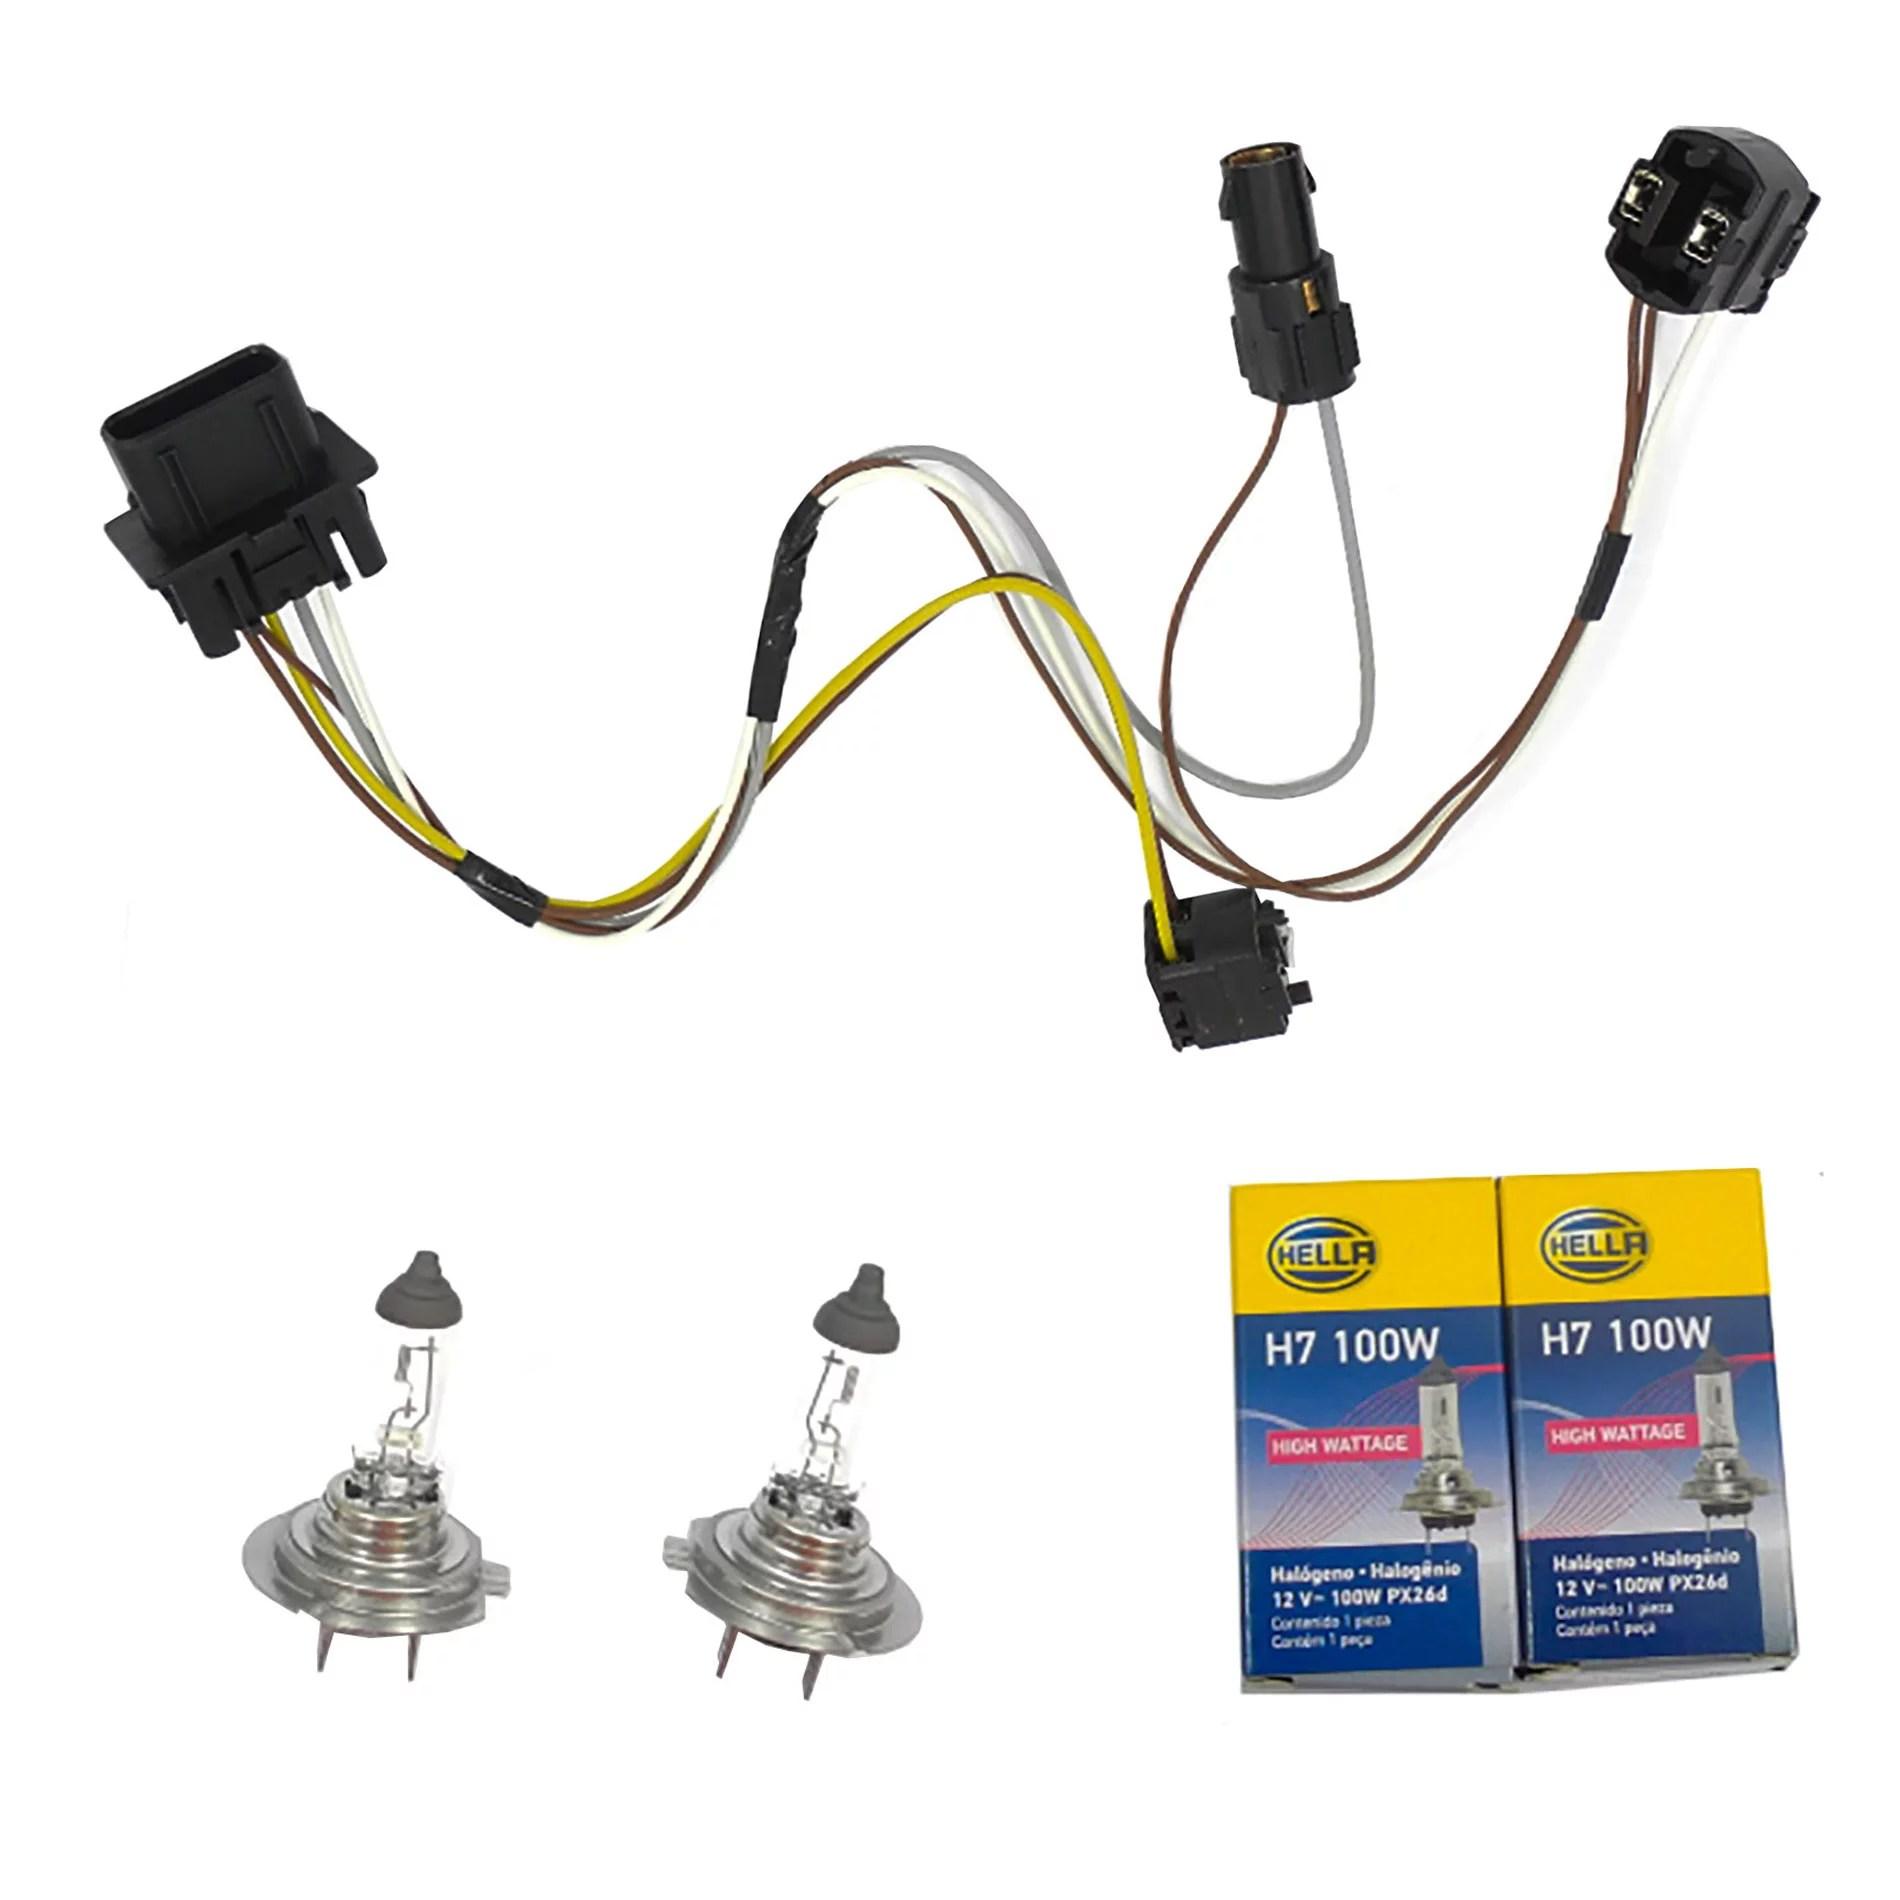 medium resolution of cf advance for 96 03 mercedes benz e300 e320 e420 e430 e500 e55 amg 1997 mercedes e320 problems 1997 mercedes e320 headlight wiring harness